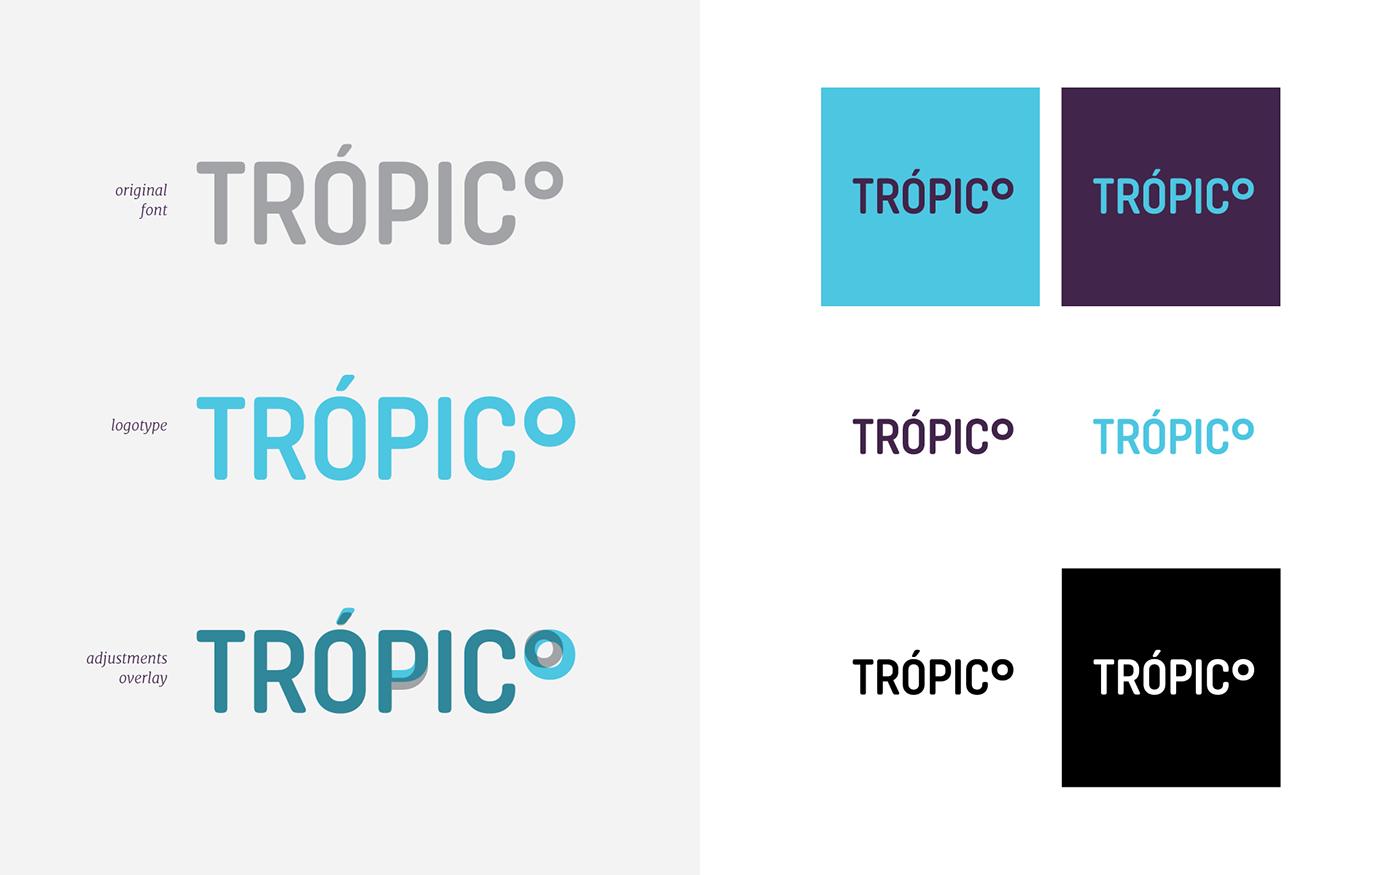 tropico Film   Video Production tropic wind vento pattern SKY graphic design  identity